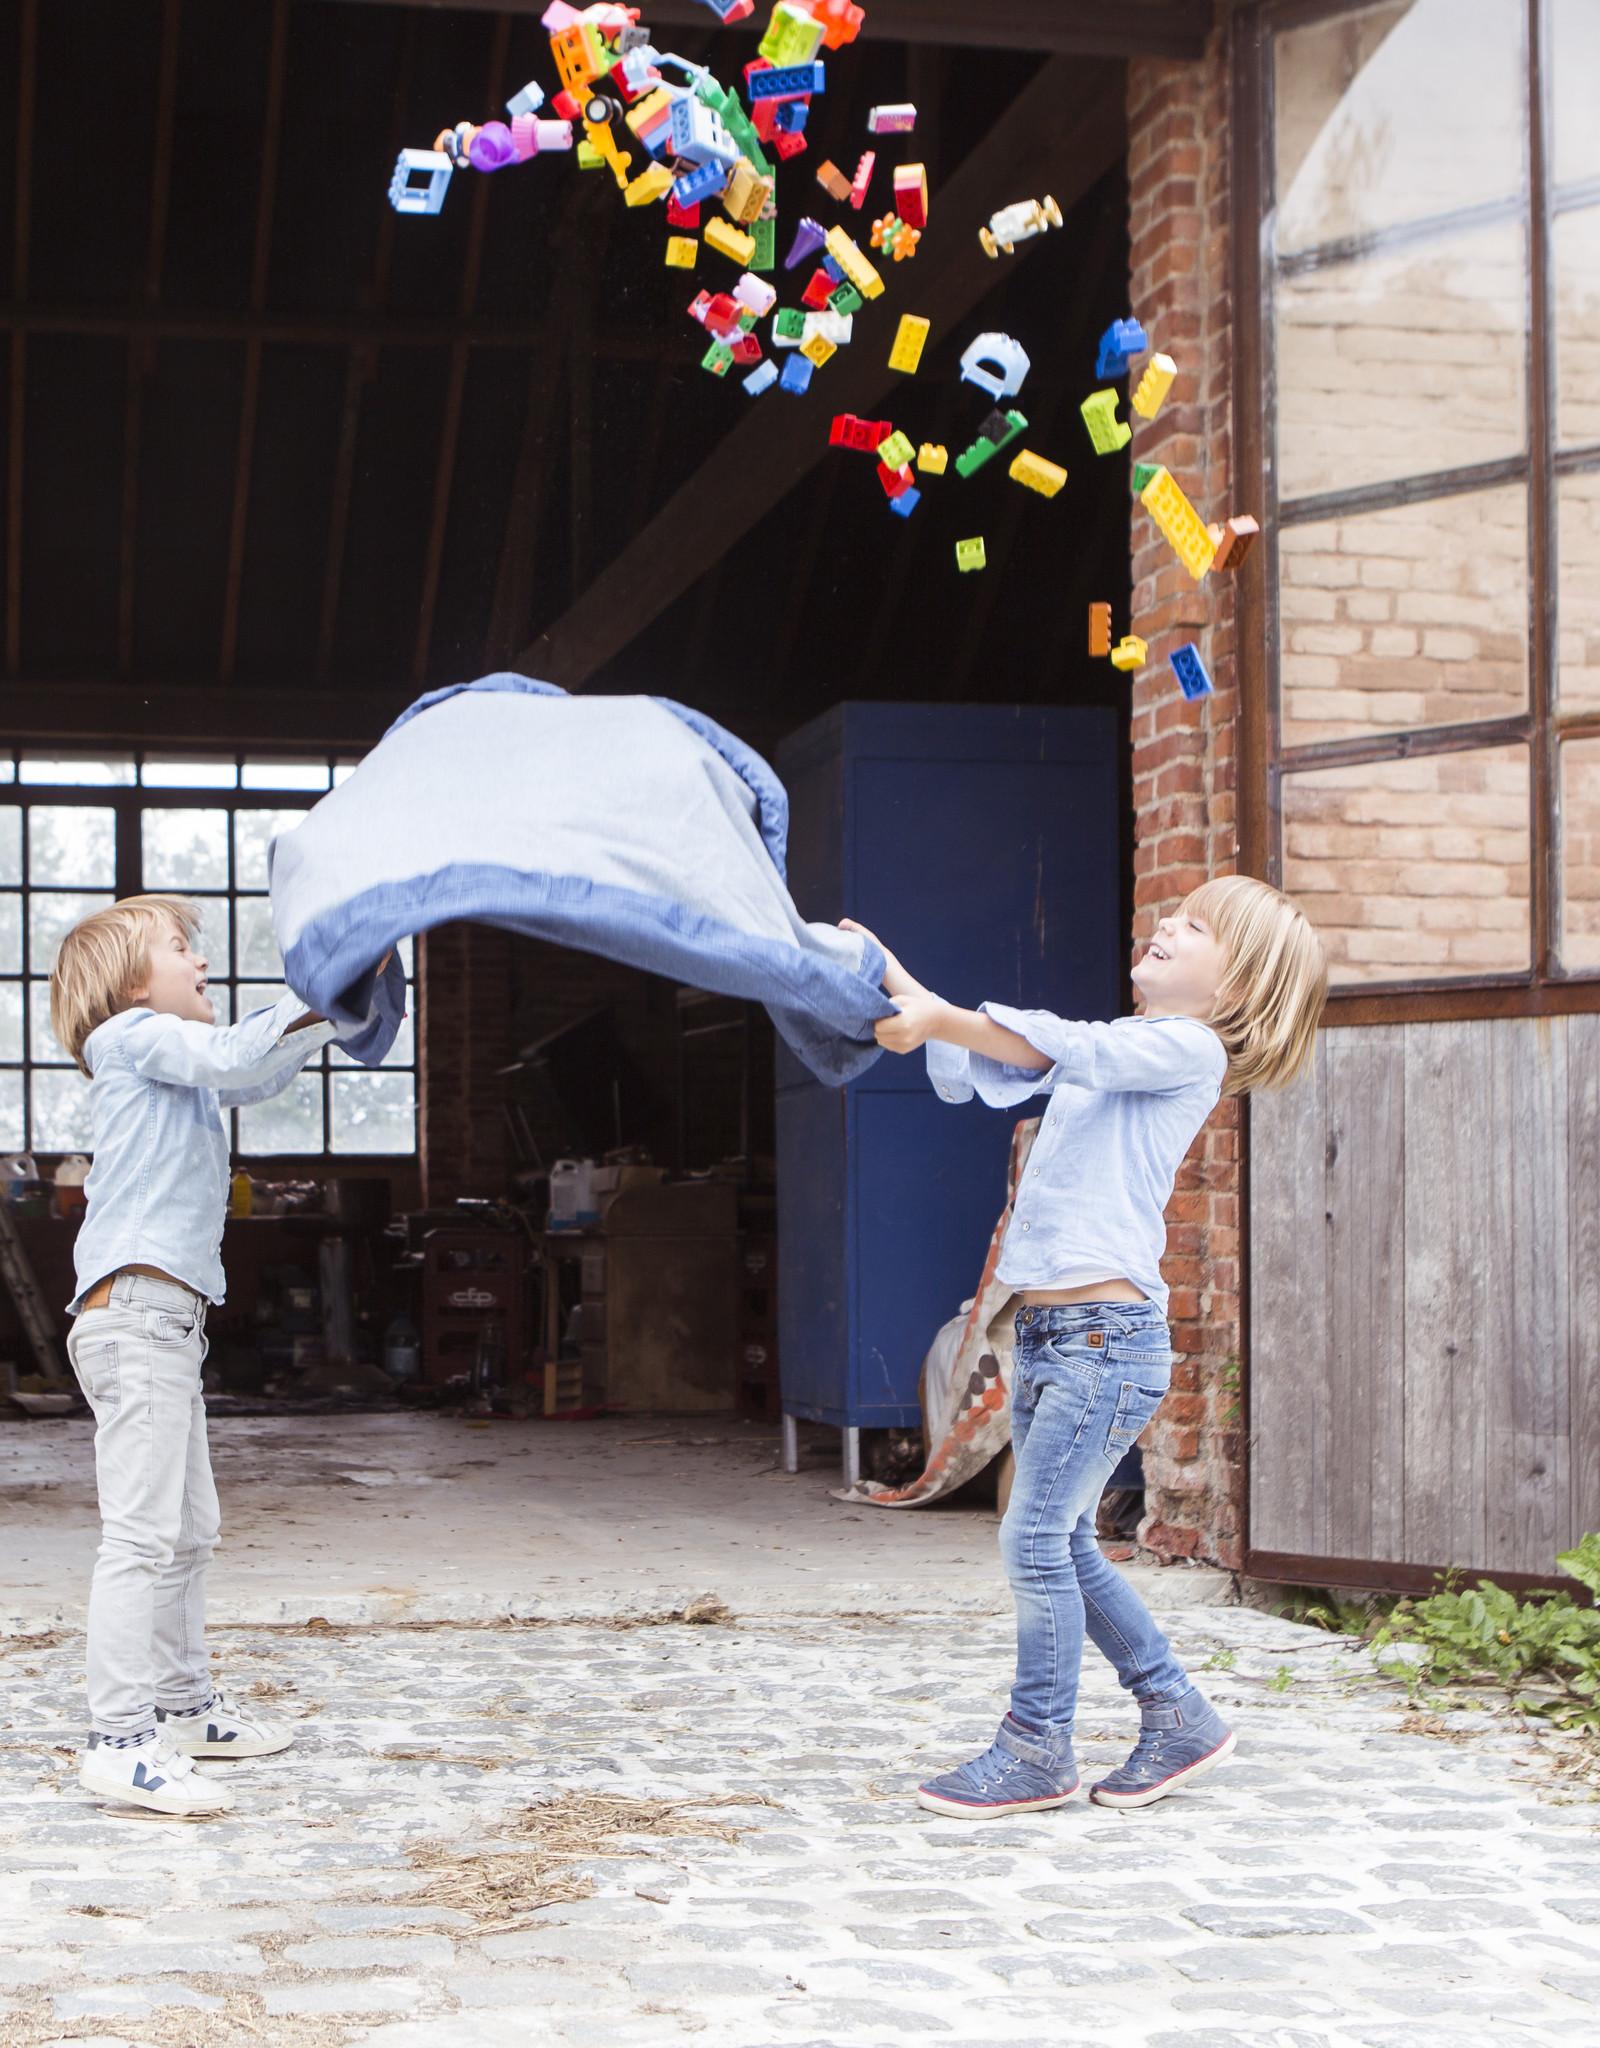 Play & Go OPBERGZAK EN SPEELMAT - JEANS